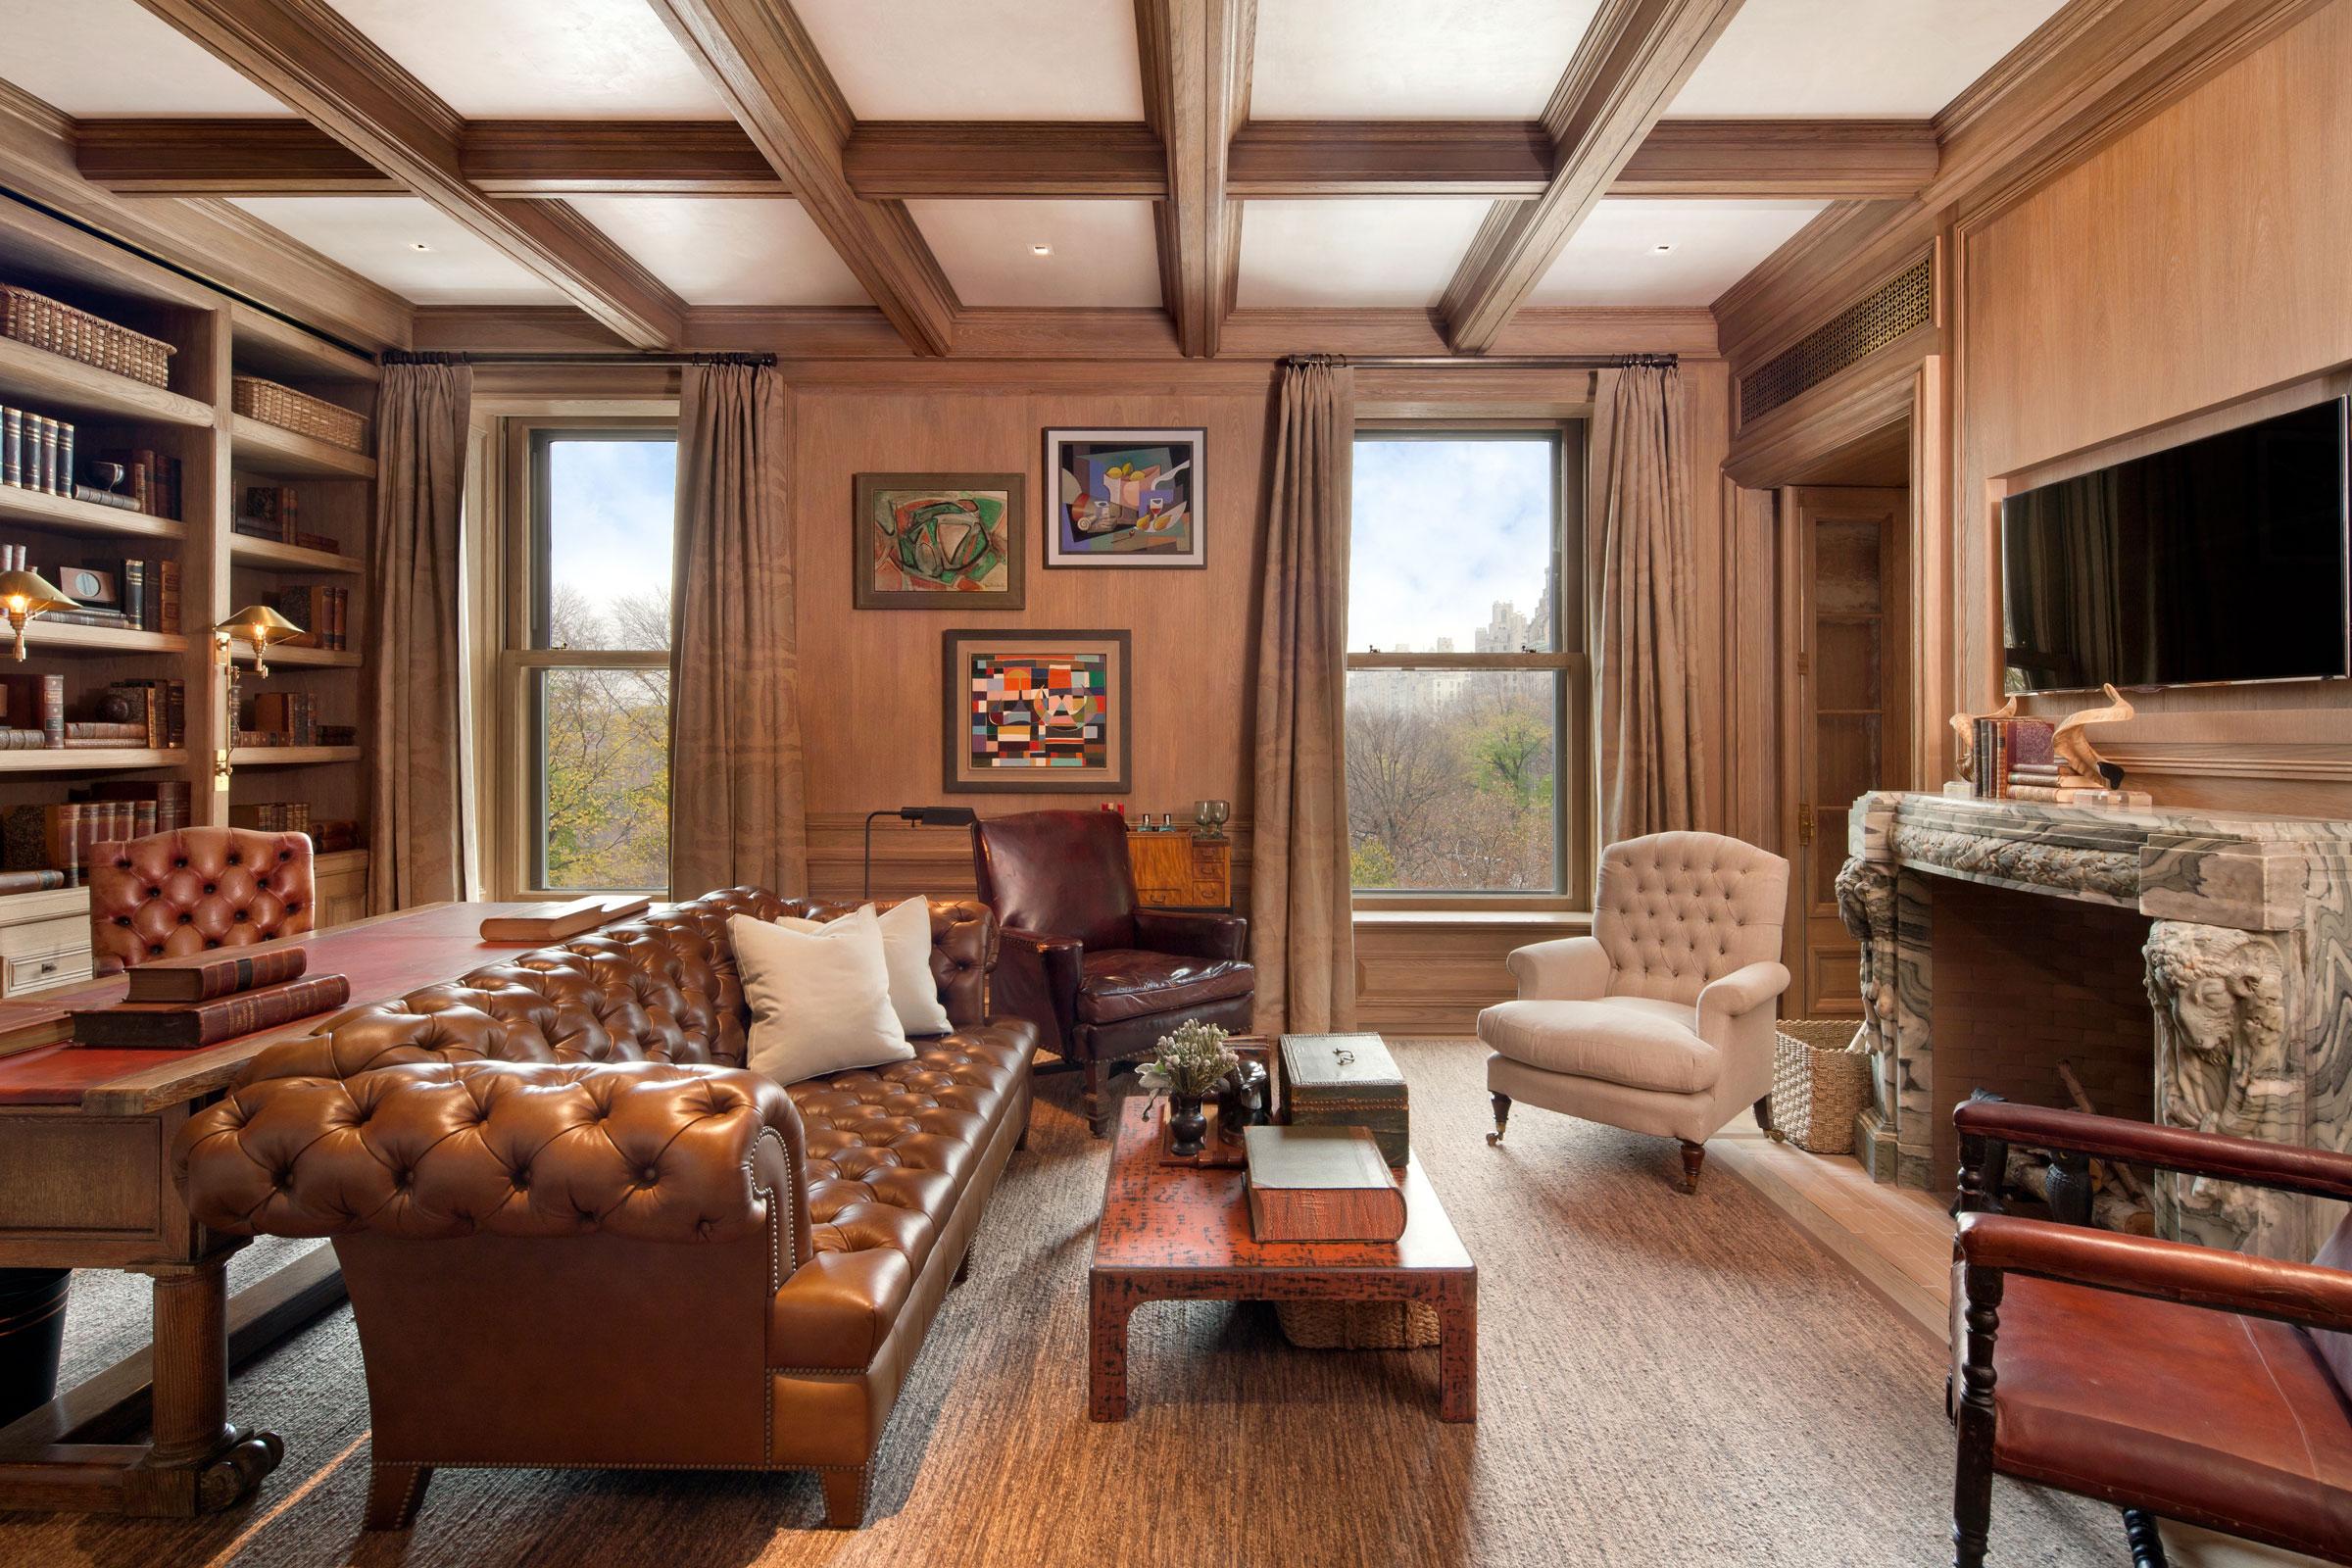 Plaza 39 S Astor Suite Manhattan 39 S Priciest Rental At 165 000 A Month Extravaganzi